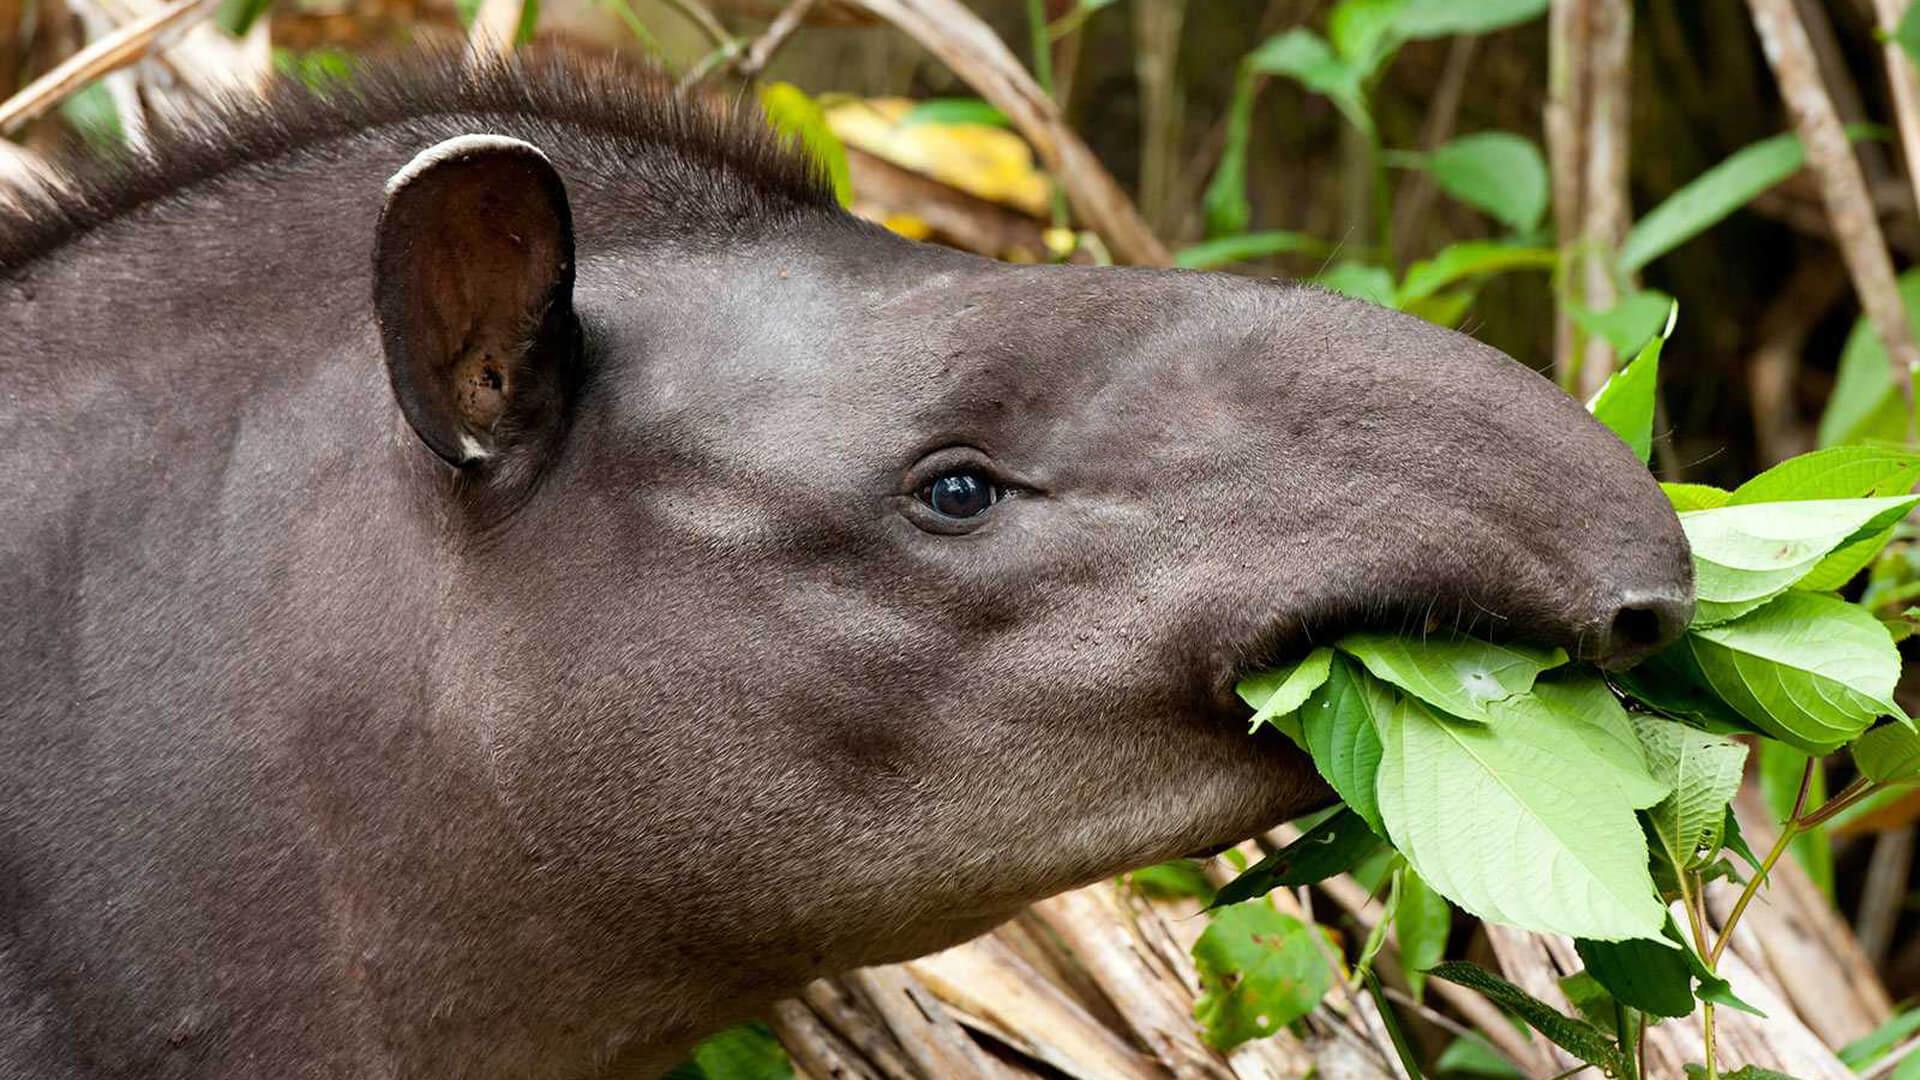 Tapir de la réserve national Pacaya-Samiria au Pérou